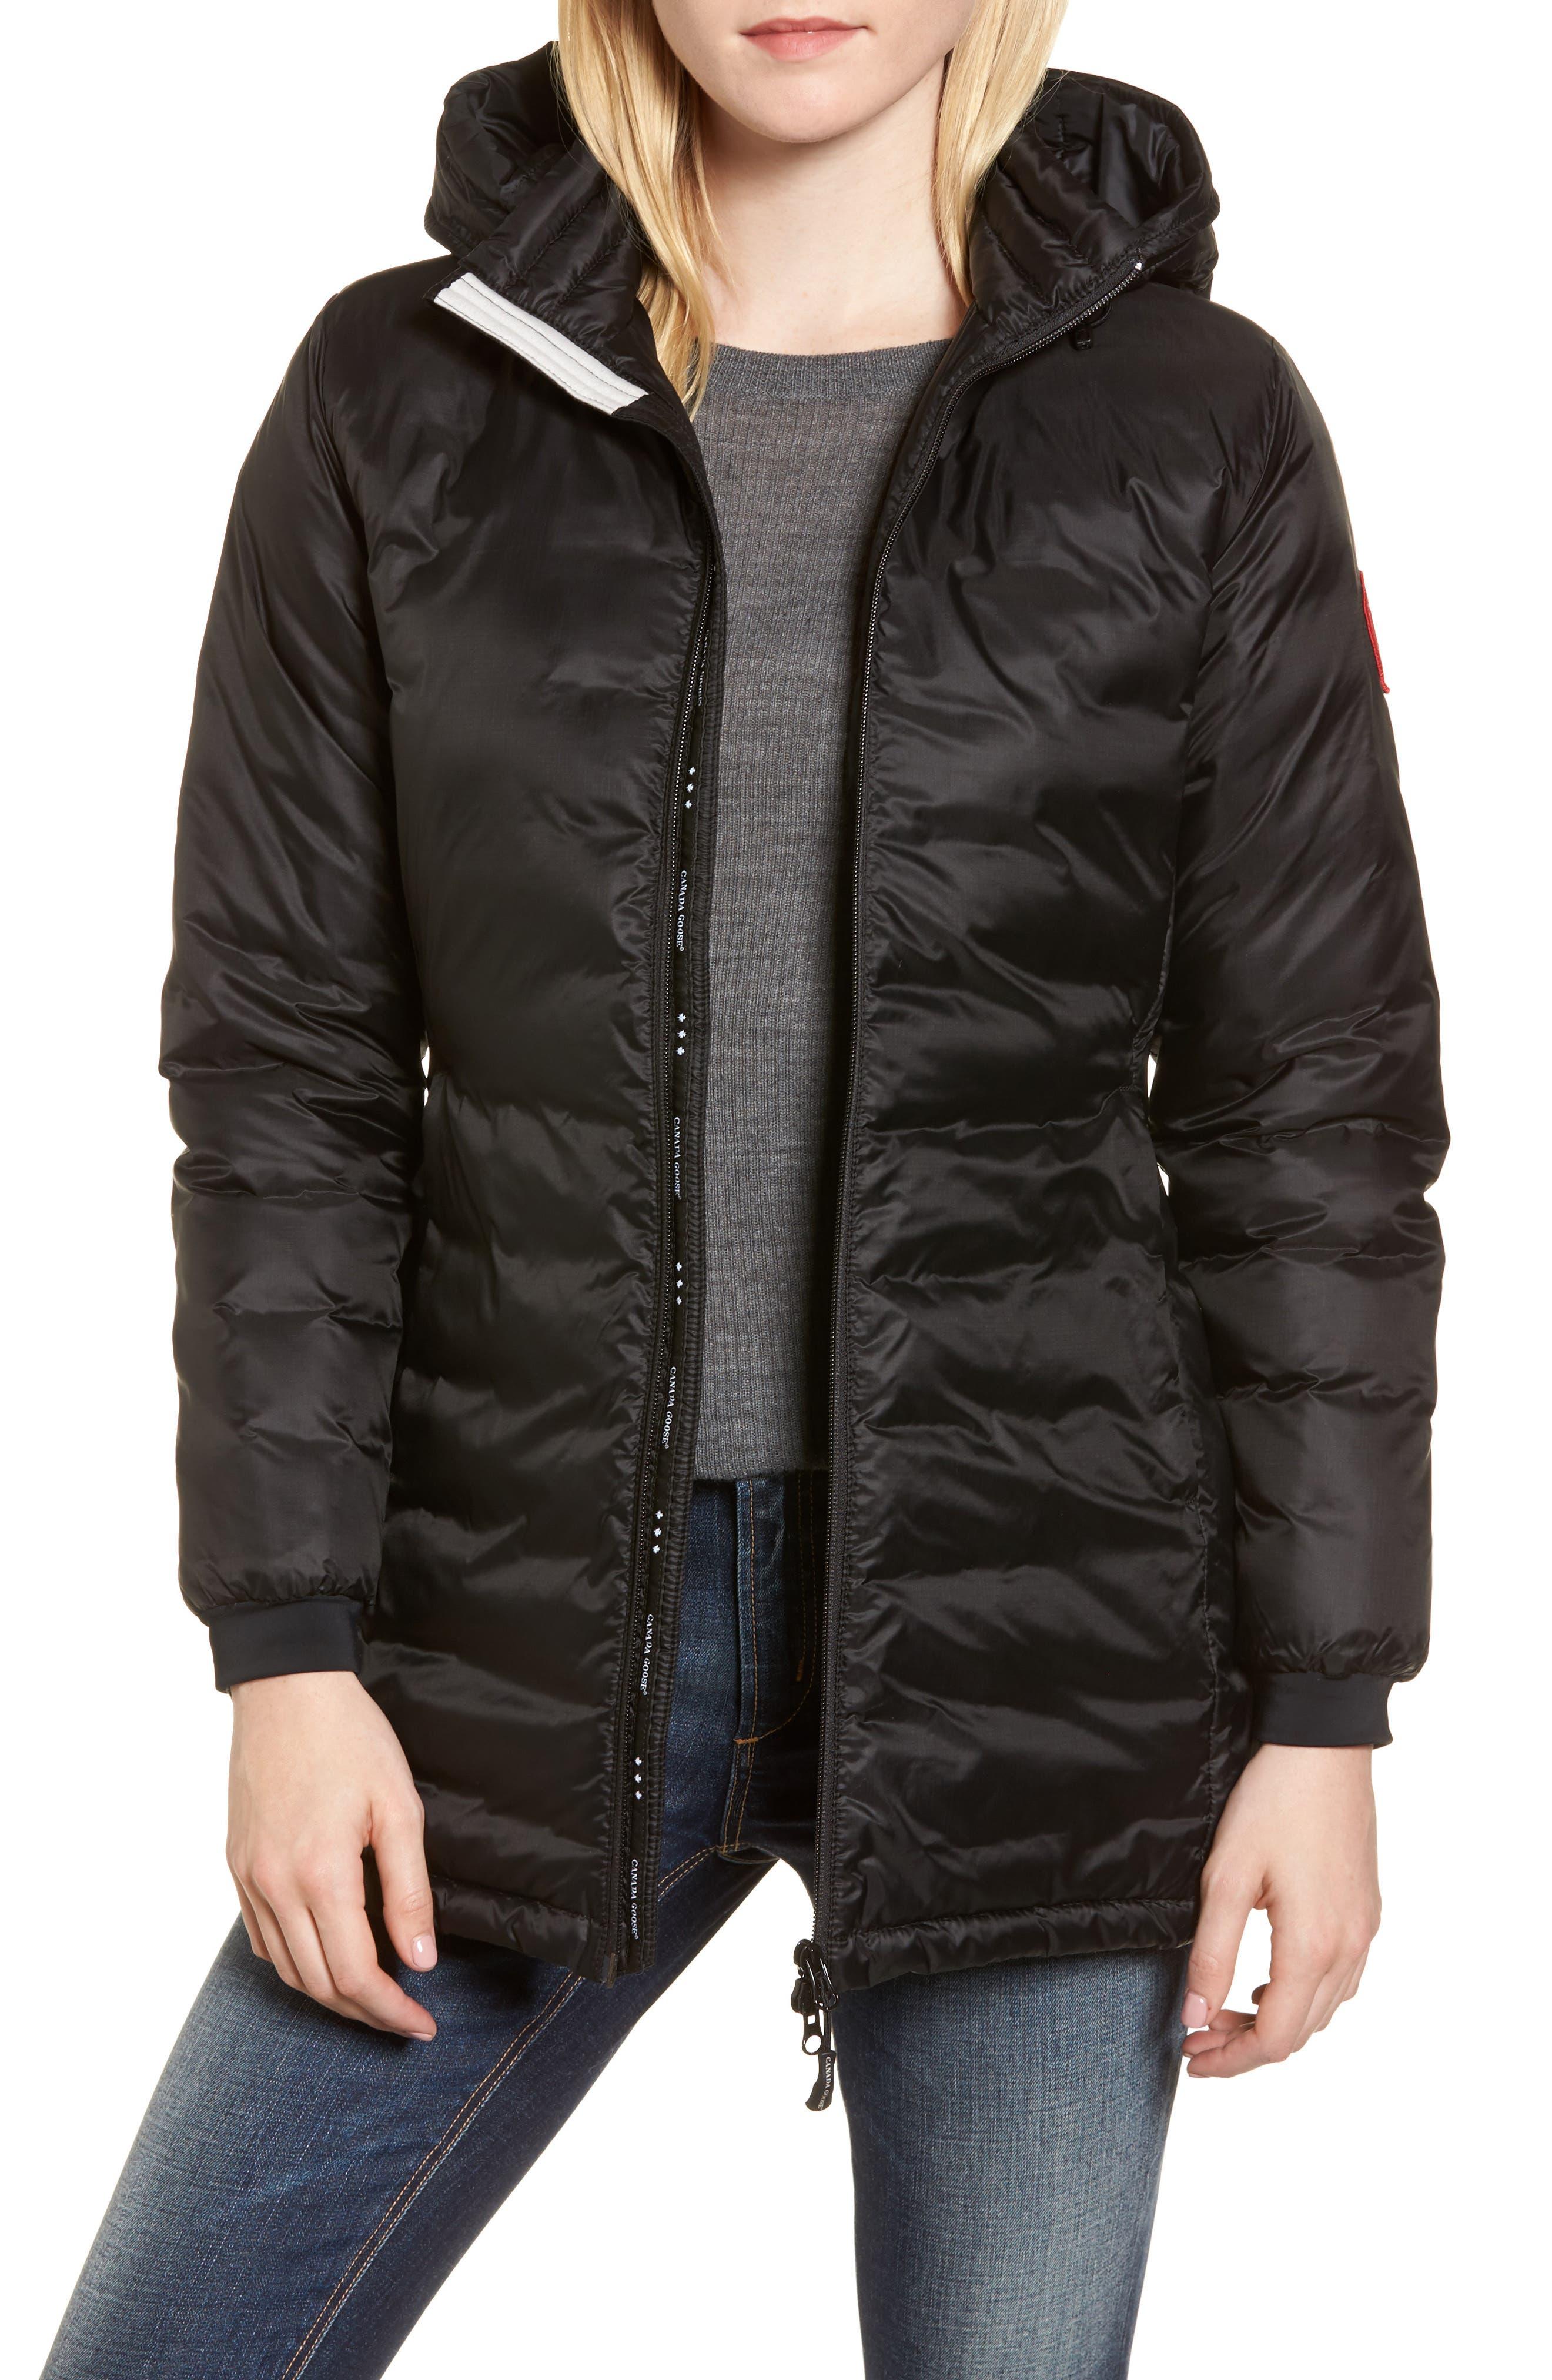 Petite Canada Goose Camp Fusion Fit Packable Down Jacket, P (10-12P) - Black